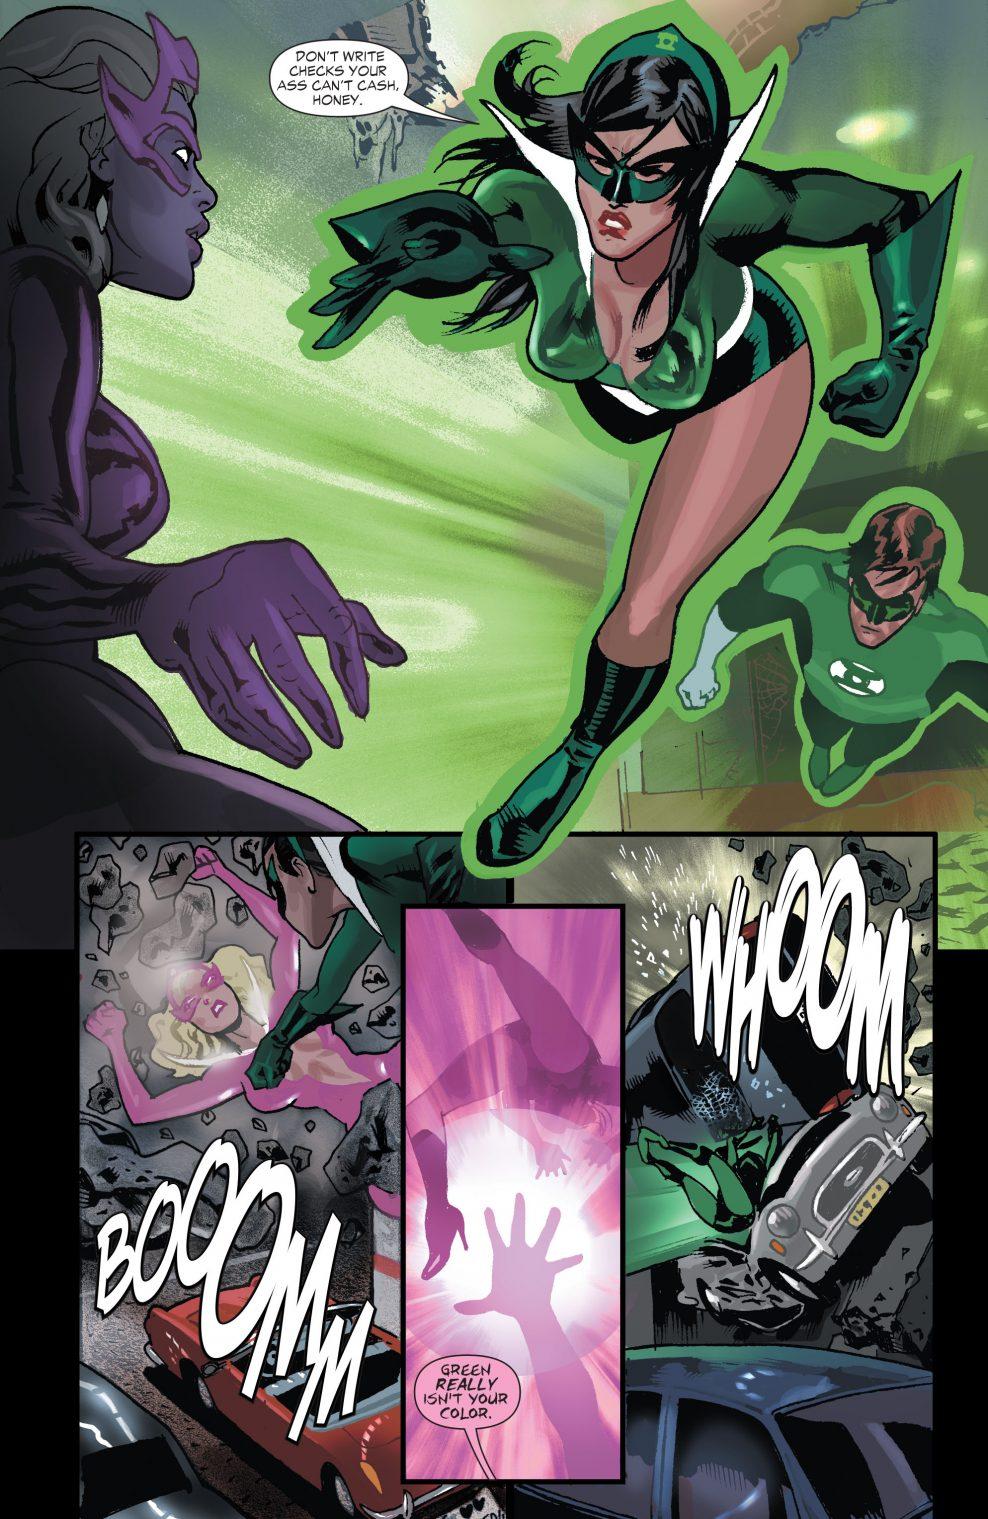 Hal Jordan Creates A Green Lantern Suit For Carol Ferris